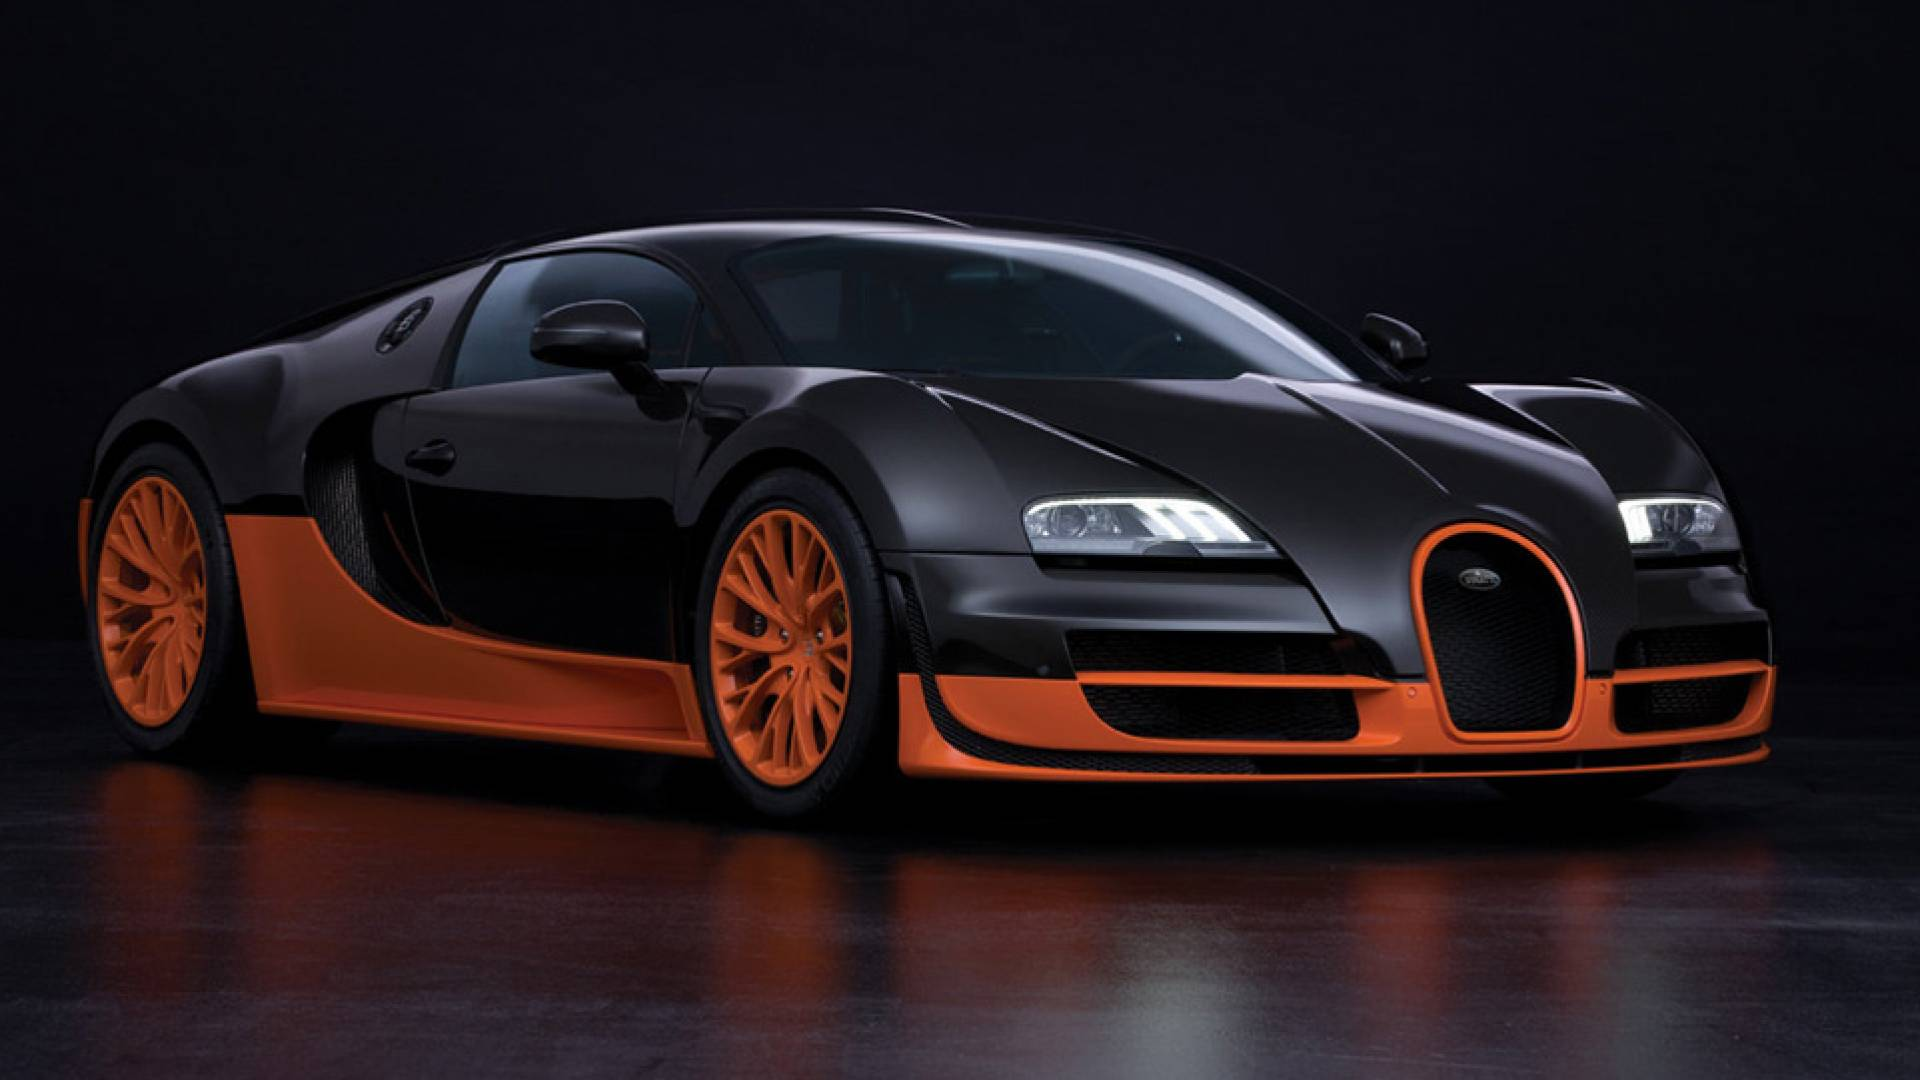 bugatti veyron super sport precios prueba ficha t cnica y fotos. Black Bedroom Furniture Sets. Home Design Ideas